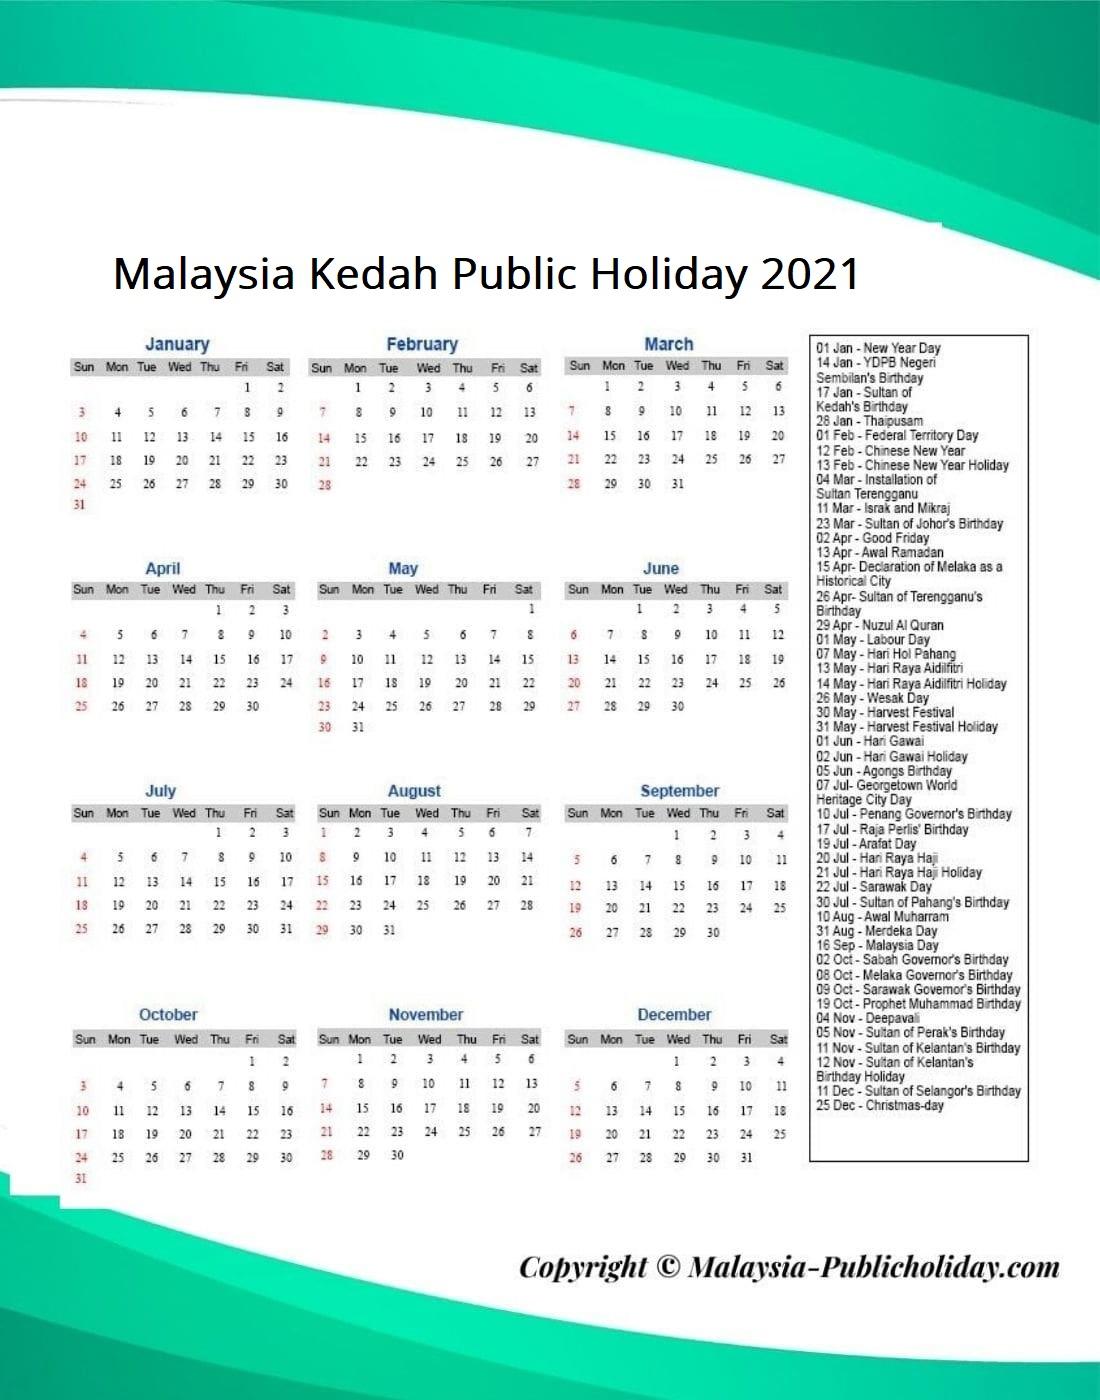 Kedah Public Holiday 2021